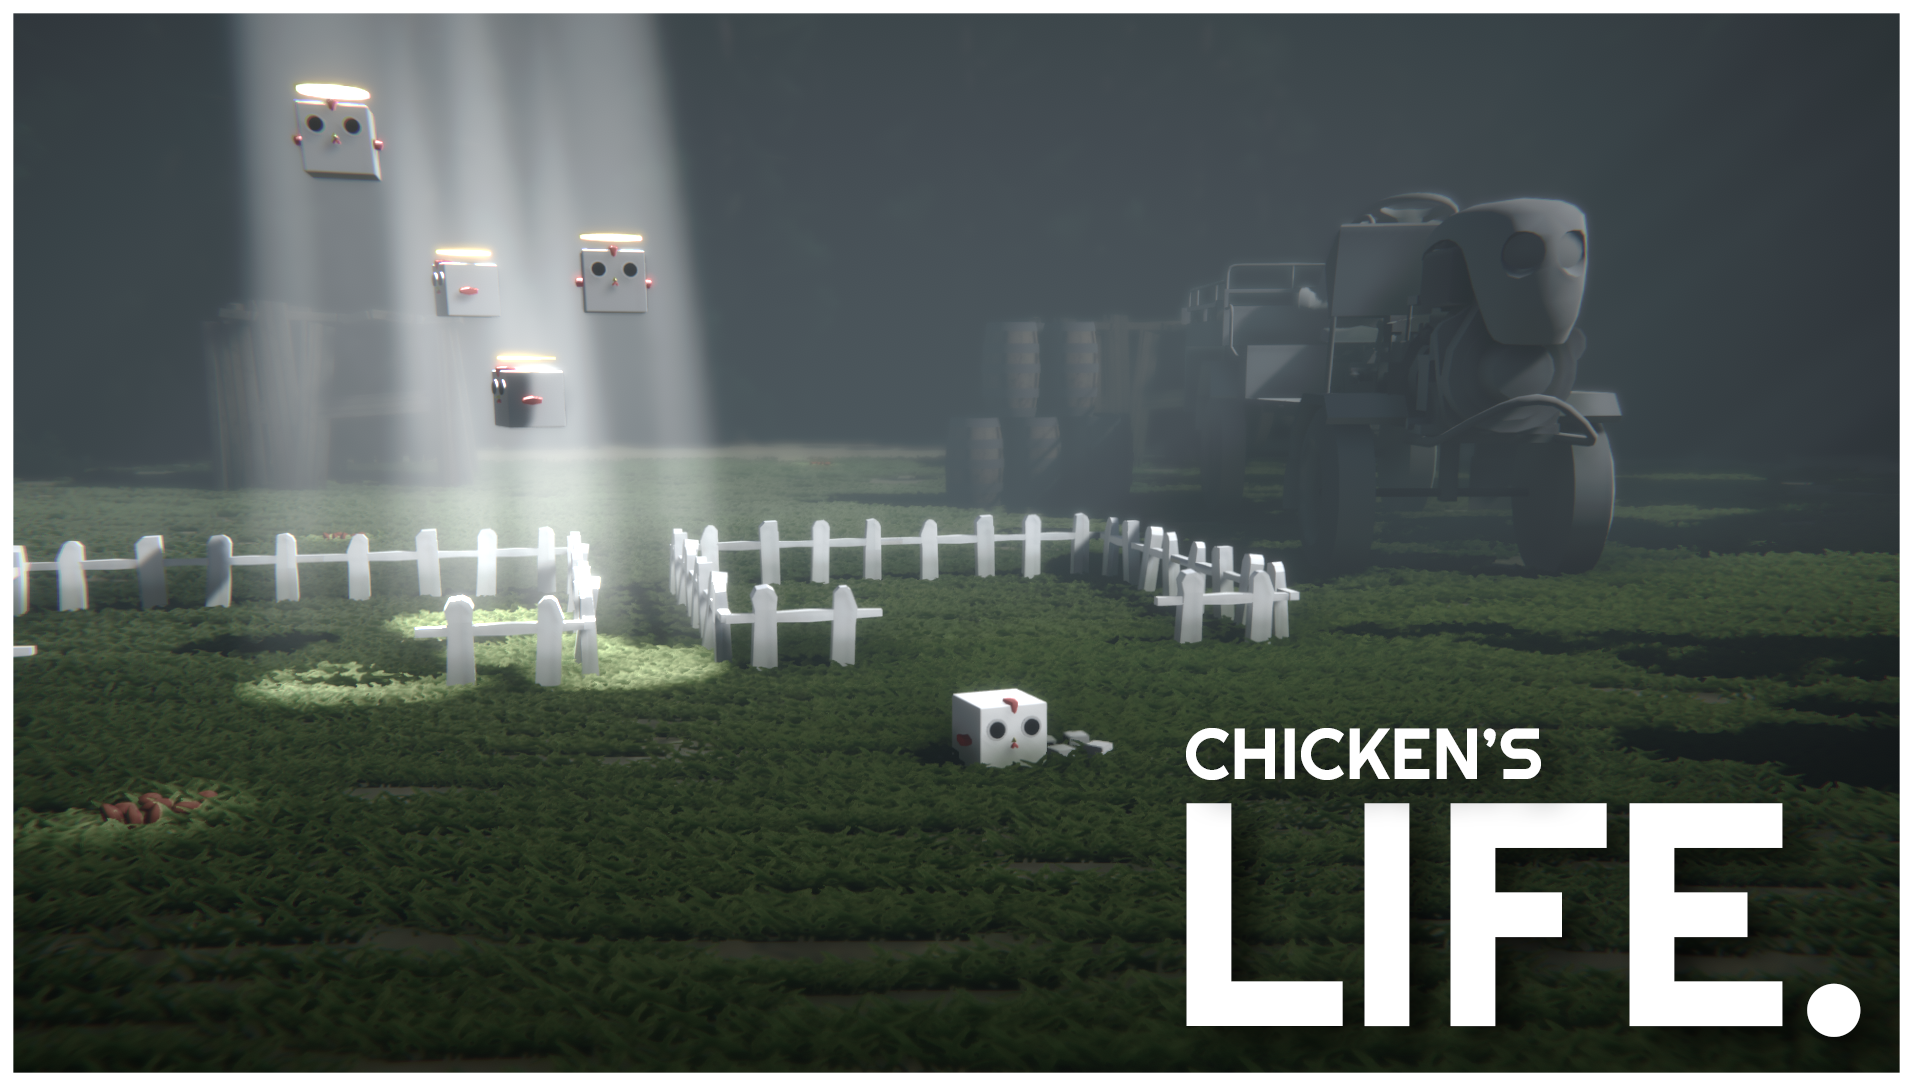 CHICKEN'S LIFE